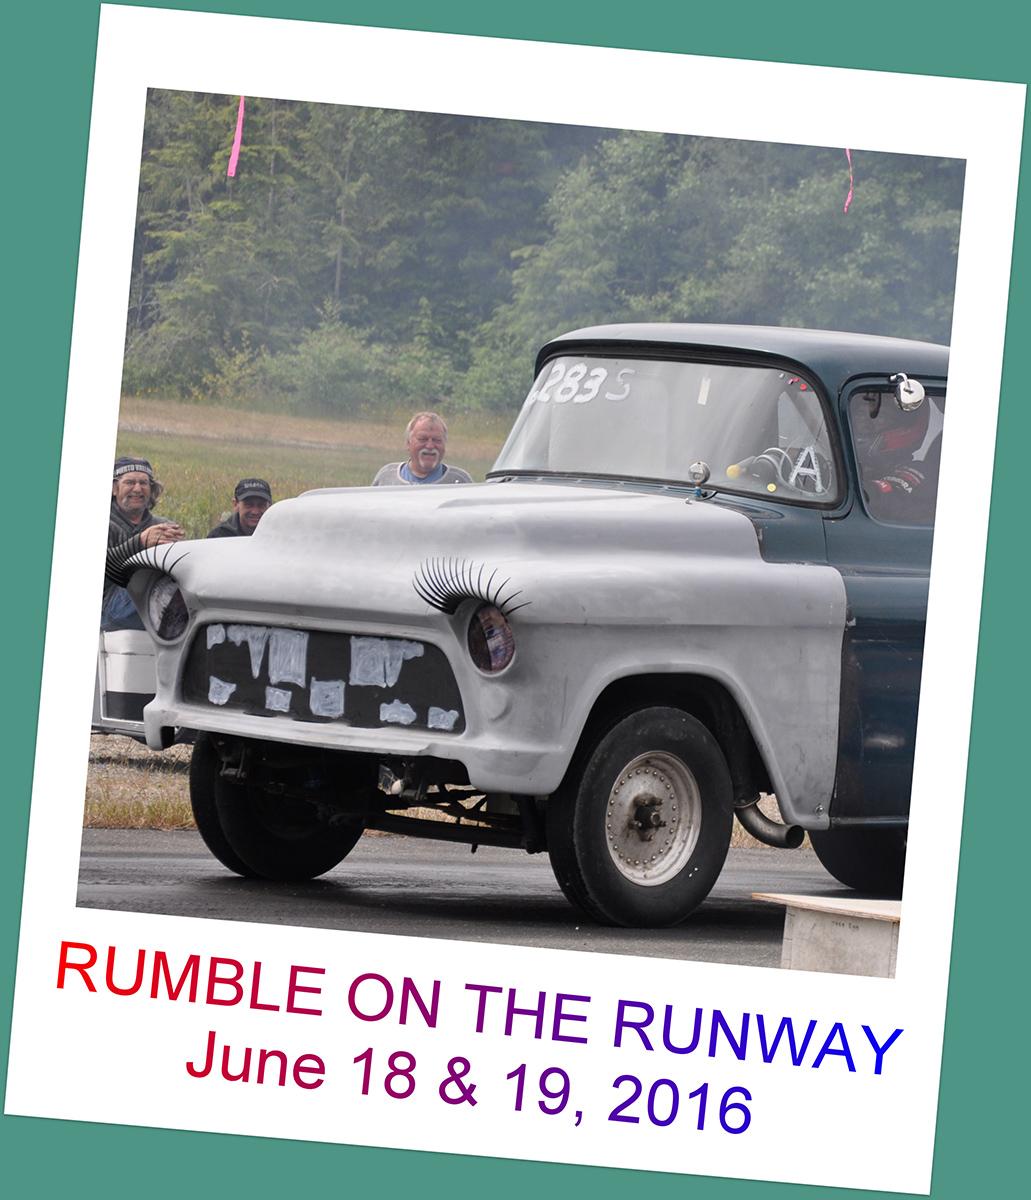 Rumble on the Runway June 18 & 19, 2016 1268